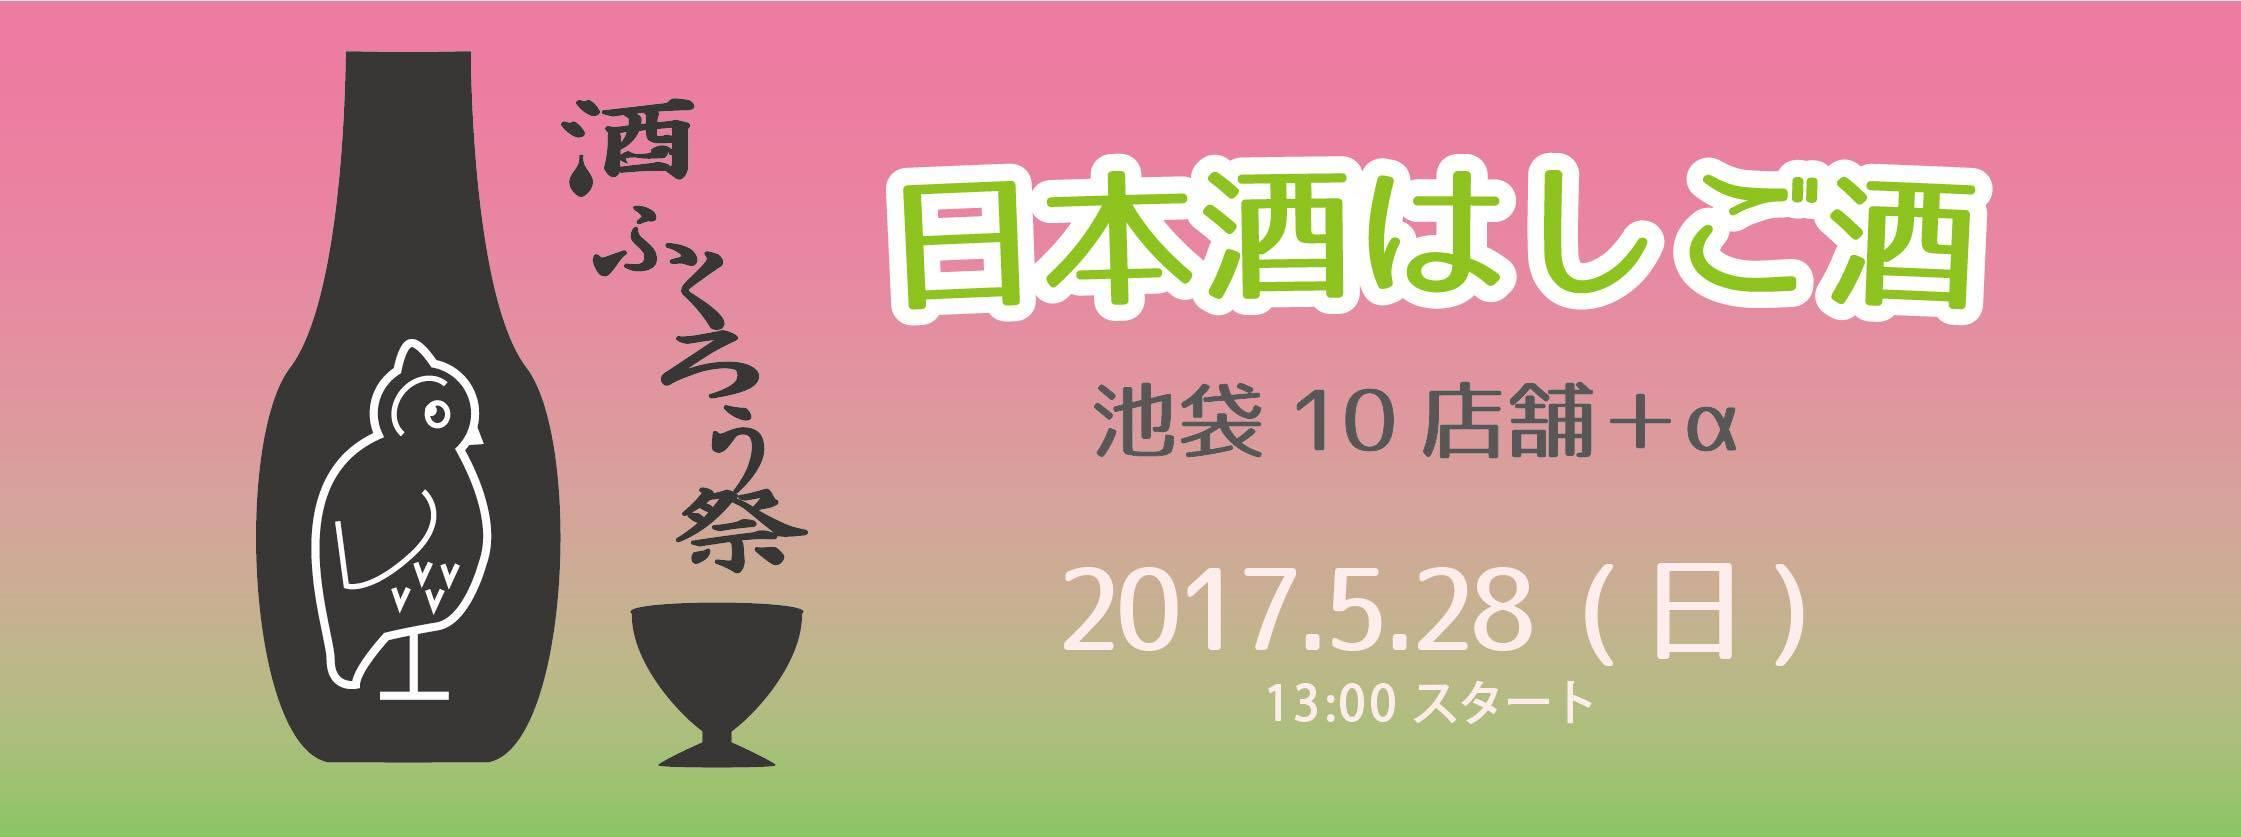 event-20170528-1.jpg